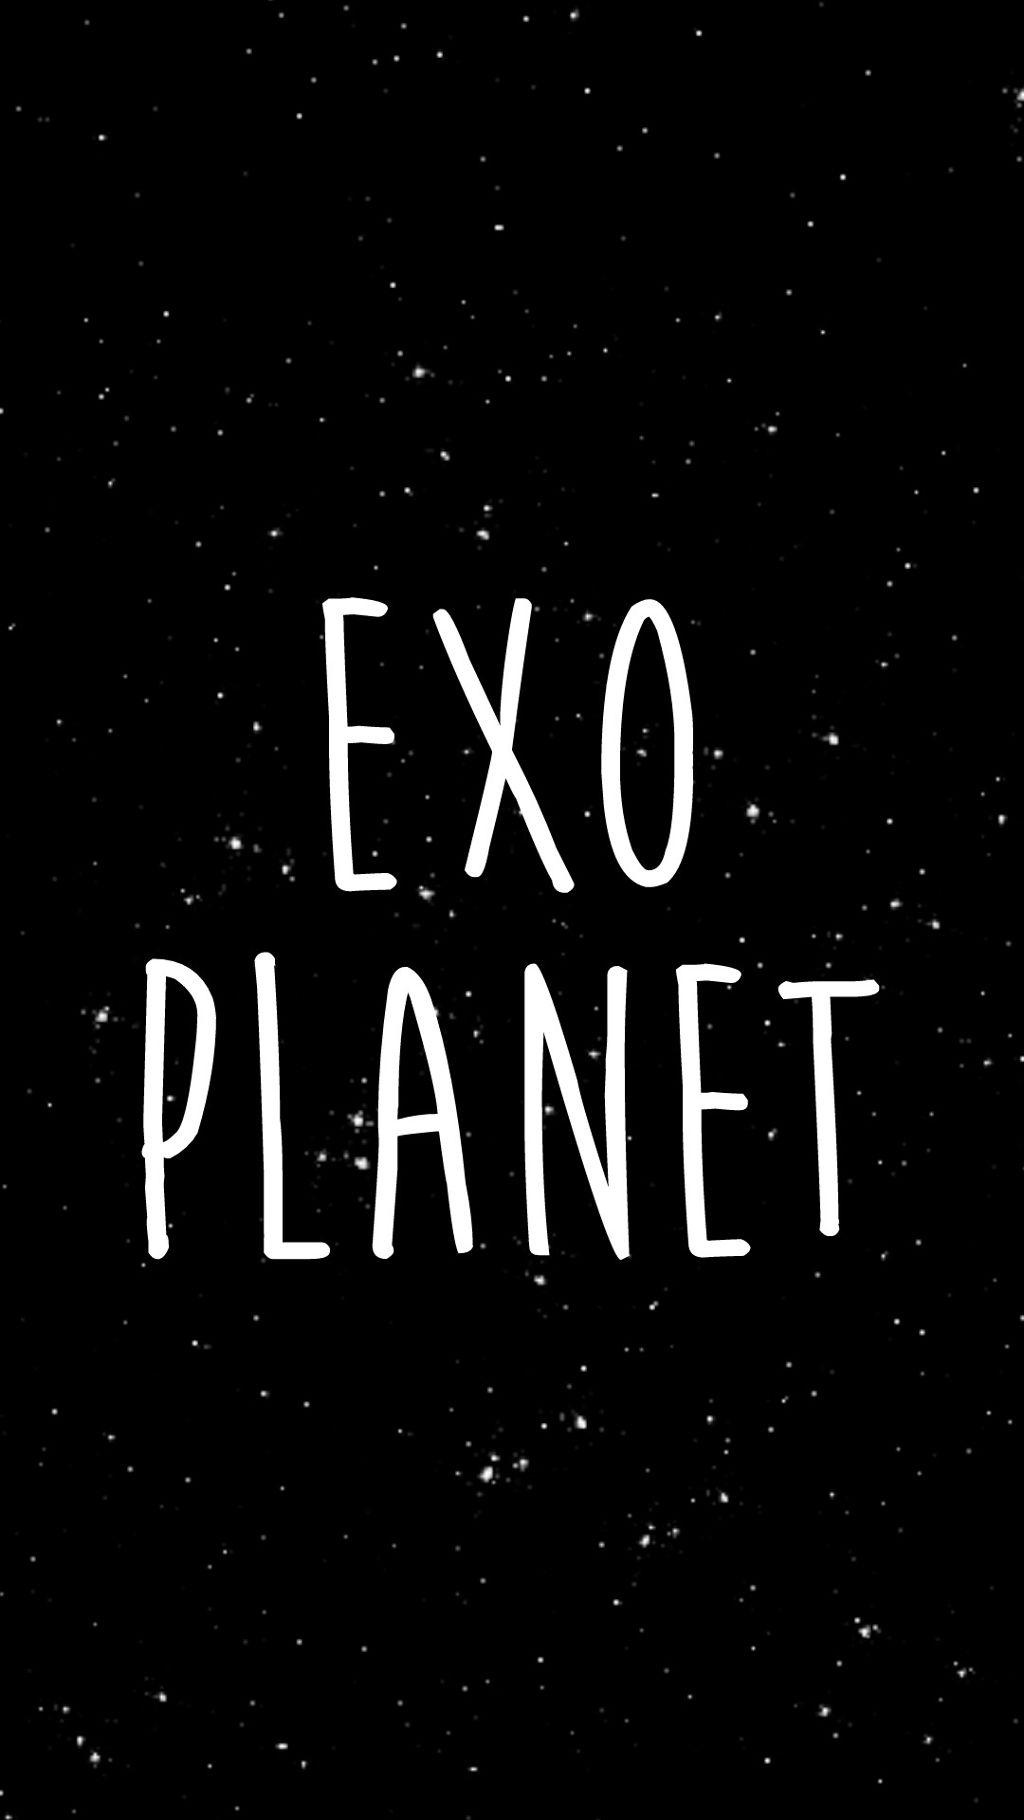 Exo Planet Wallpaper Black Stars Xiumin Suho Lay Chen